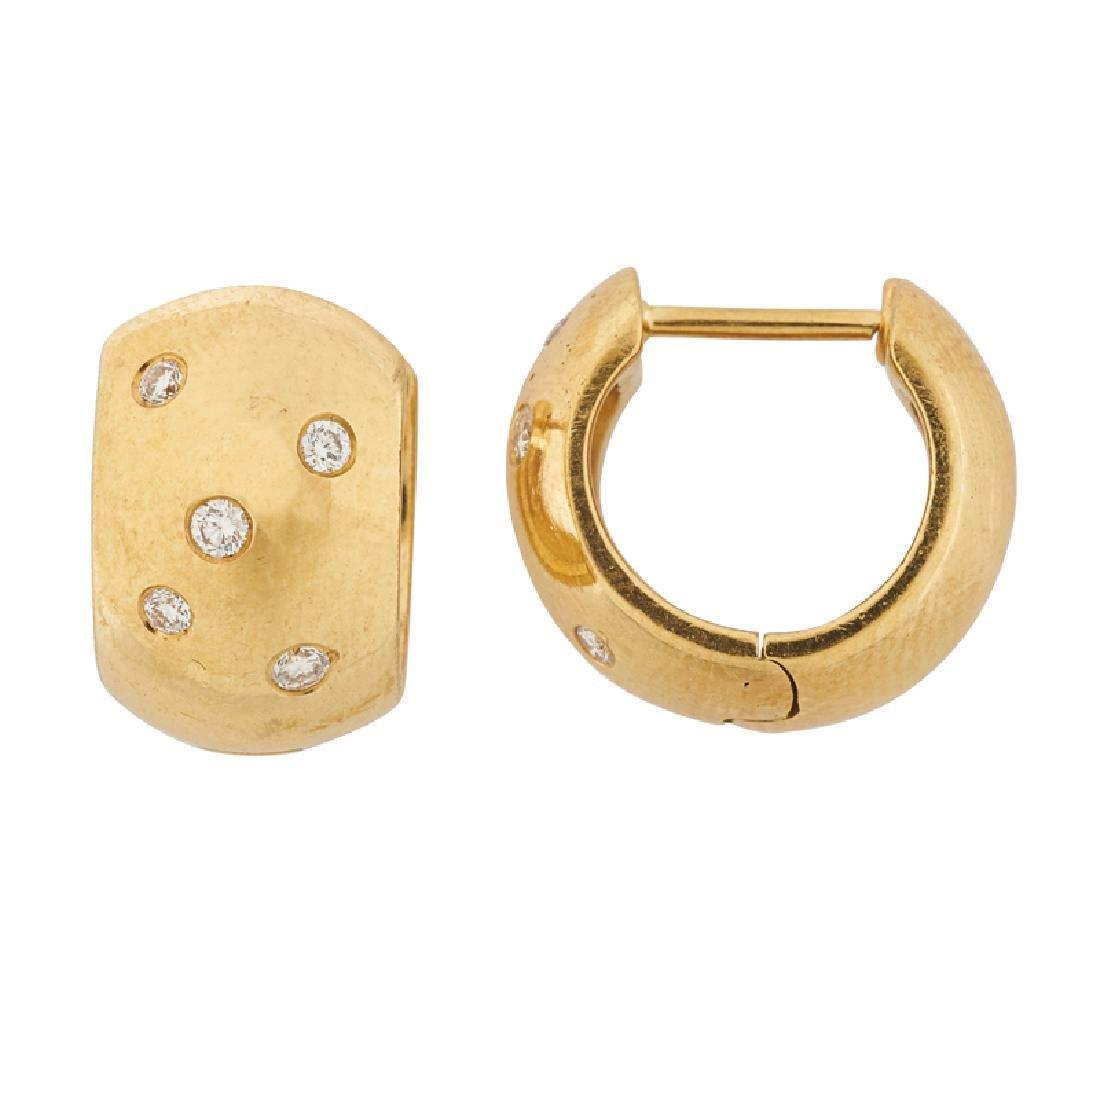 DIAMOND & YELLOW GOLD HUGGIE EARRINGS